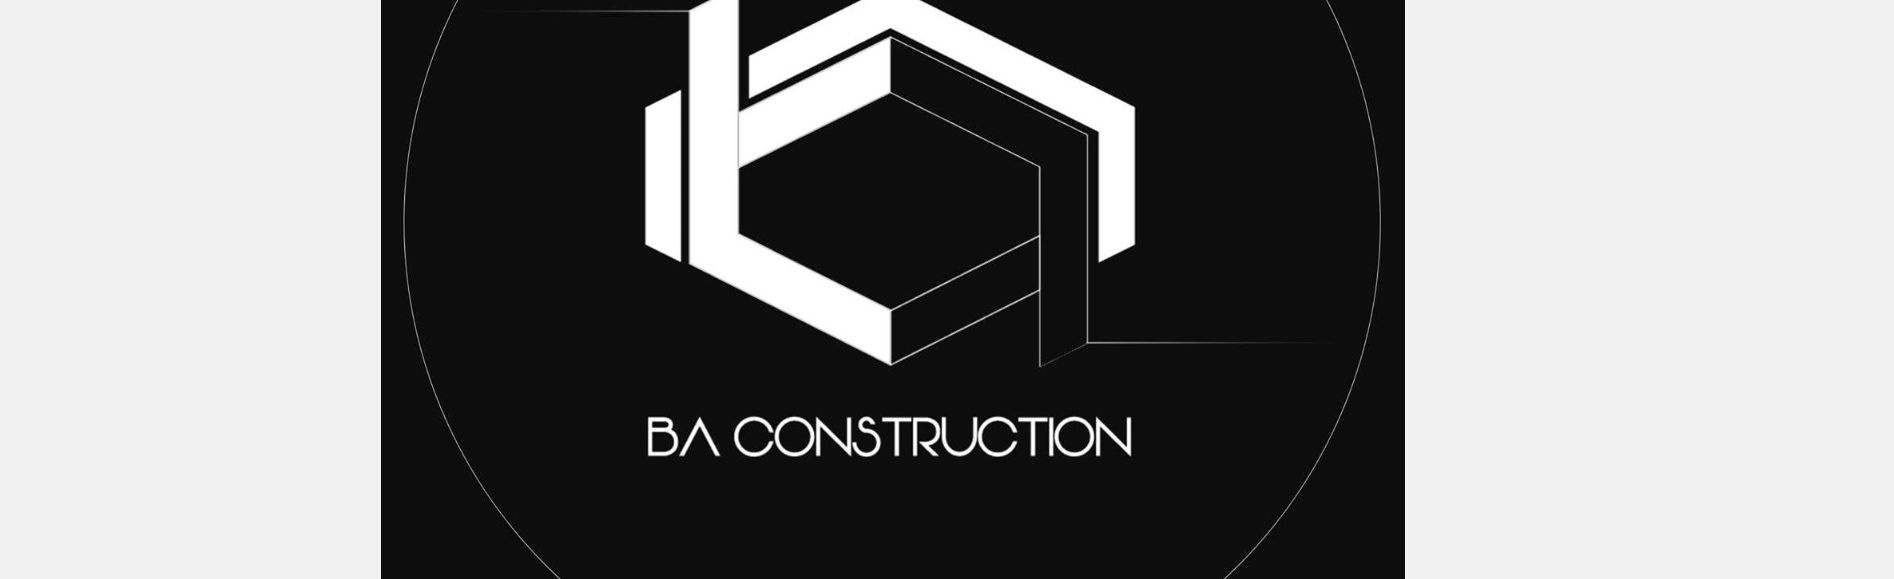 Ba Construction Lake Villa Il 60046 Networx